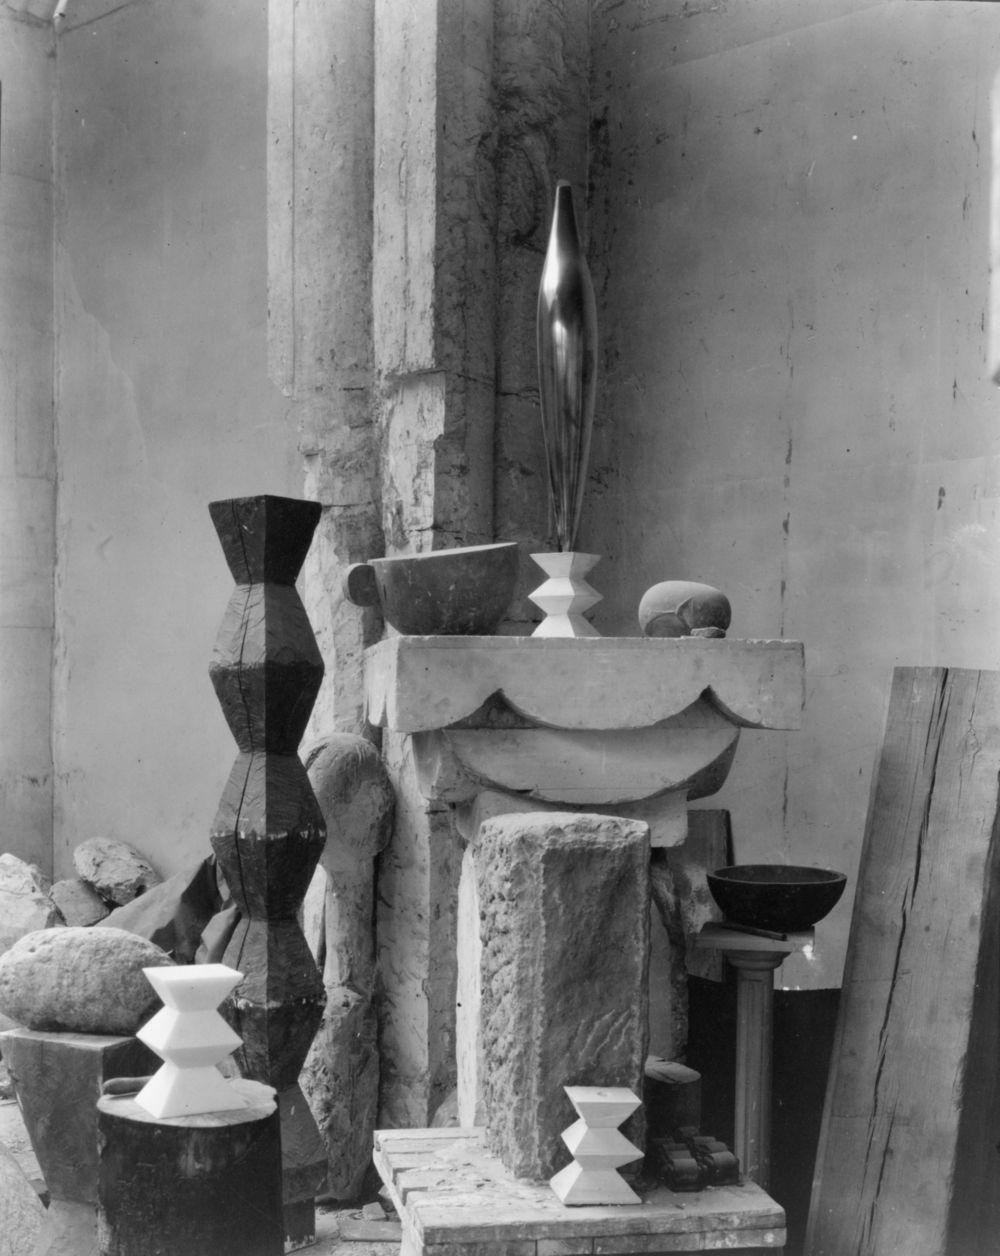 Edward_Steichen_-_Brancusi's_studio,_1920.jpeg